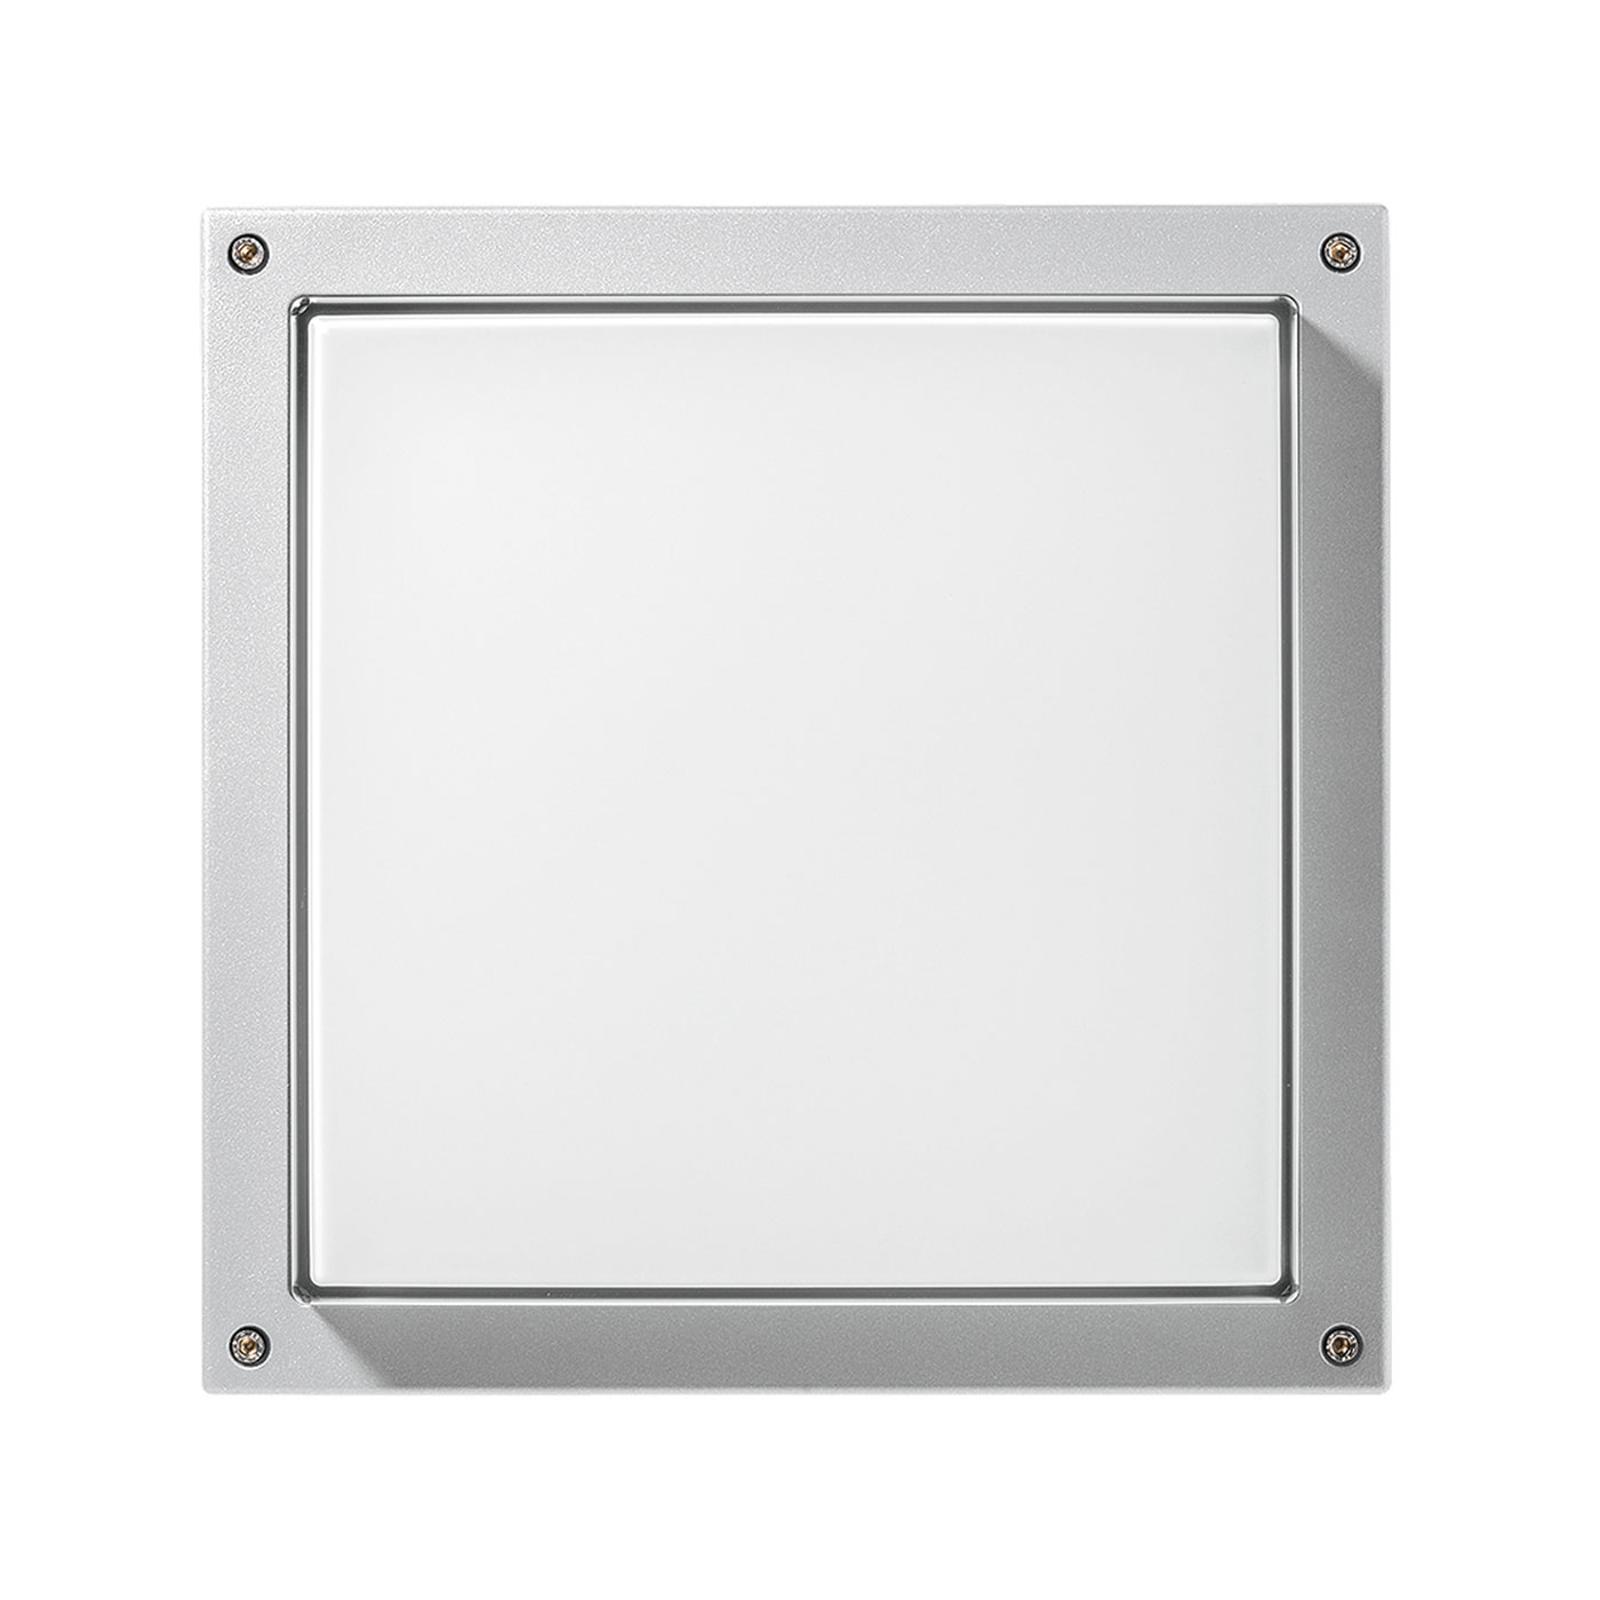 LED-Wandleuchte Bliz Square 40, 3.000K, weiß